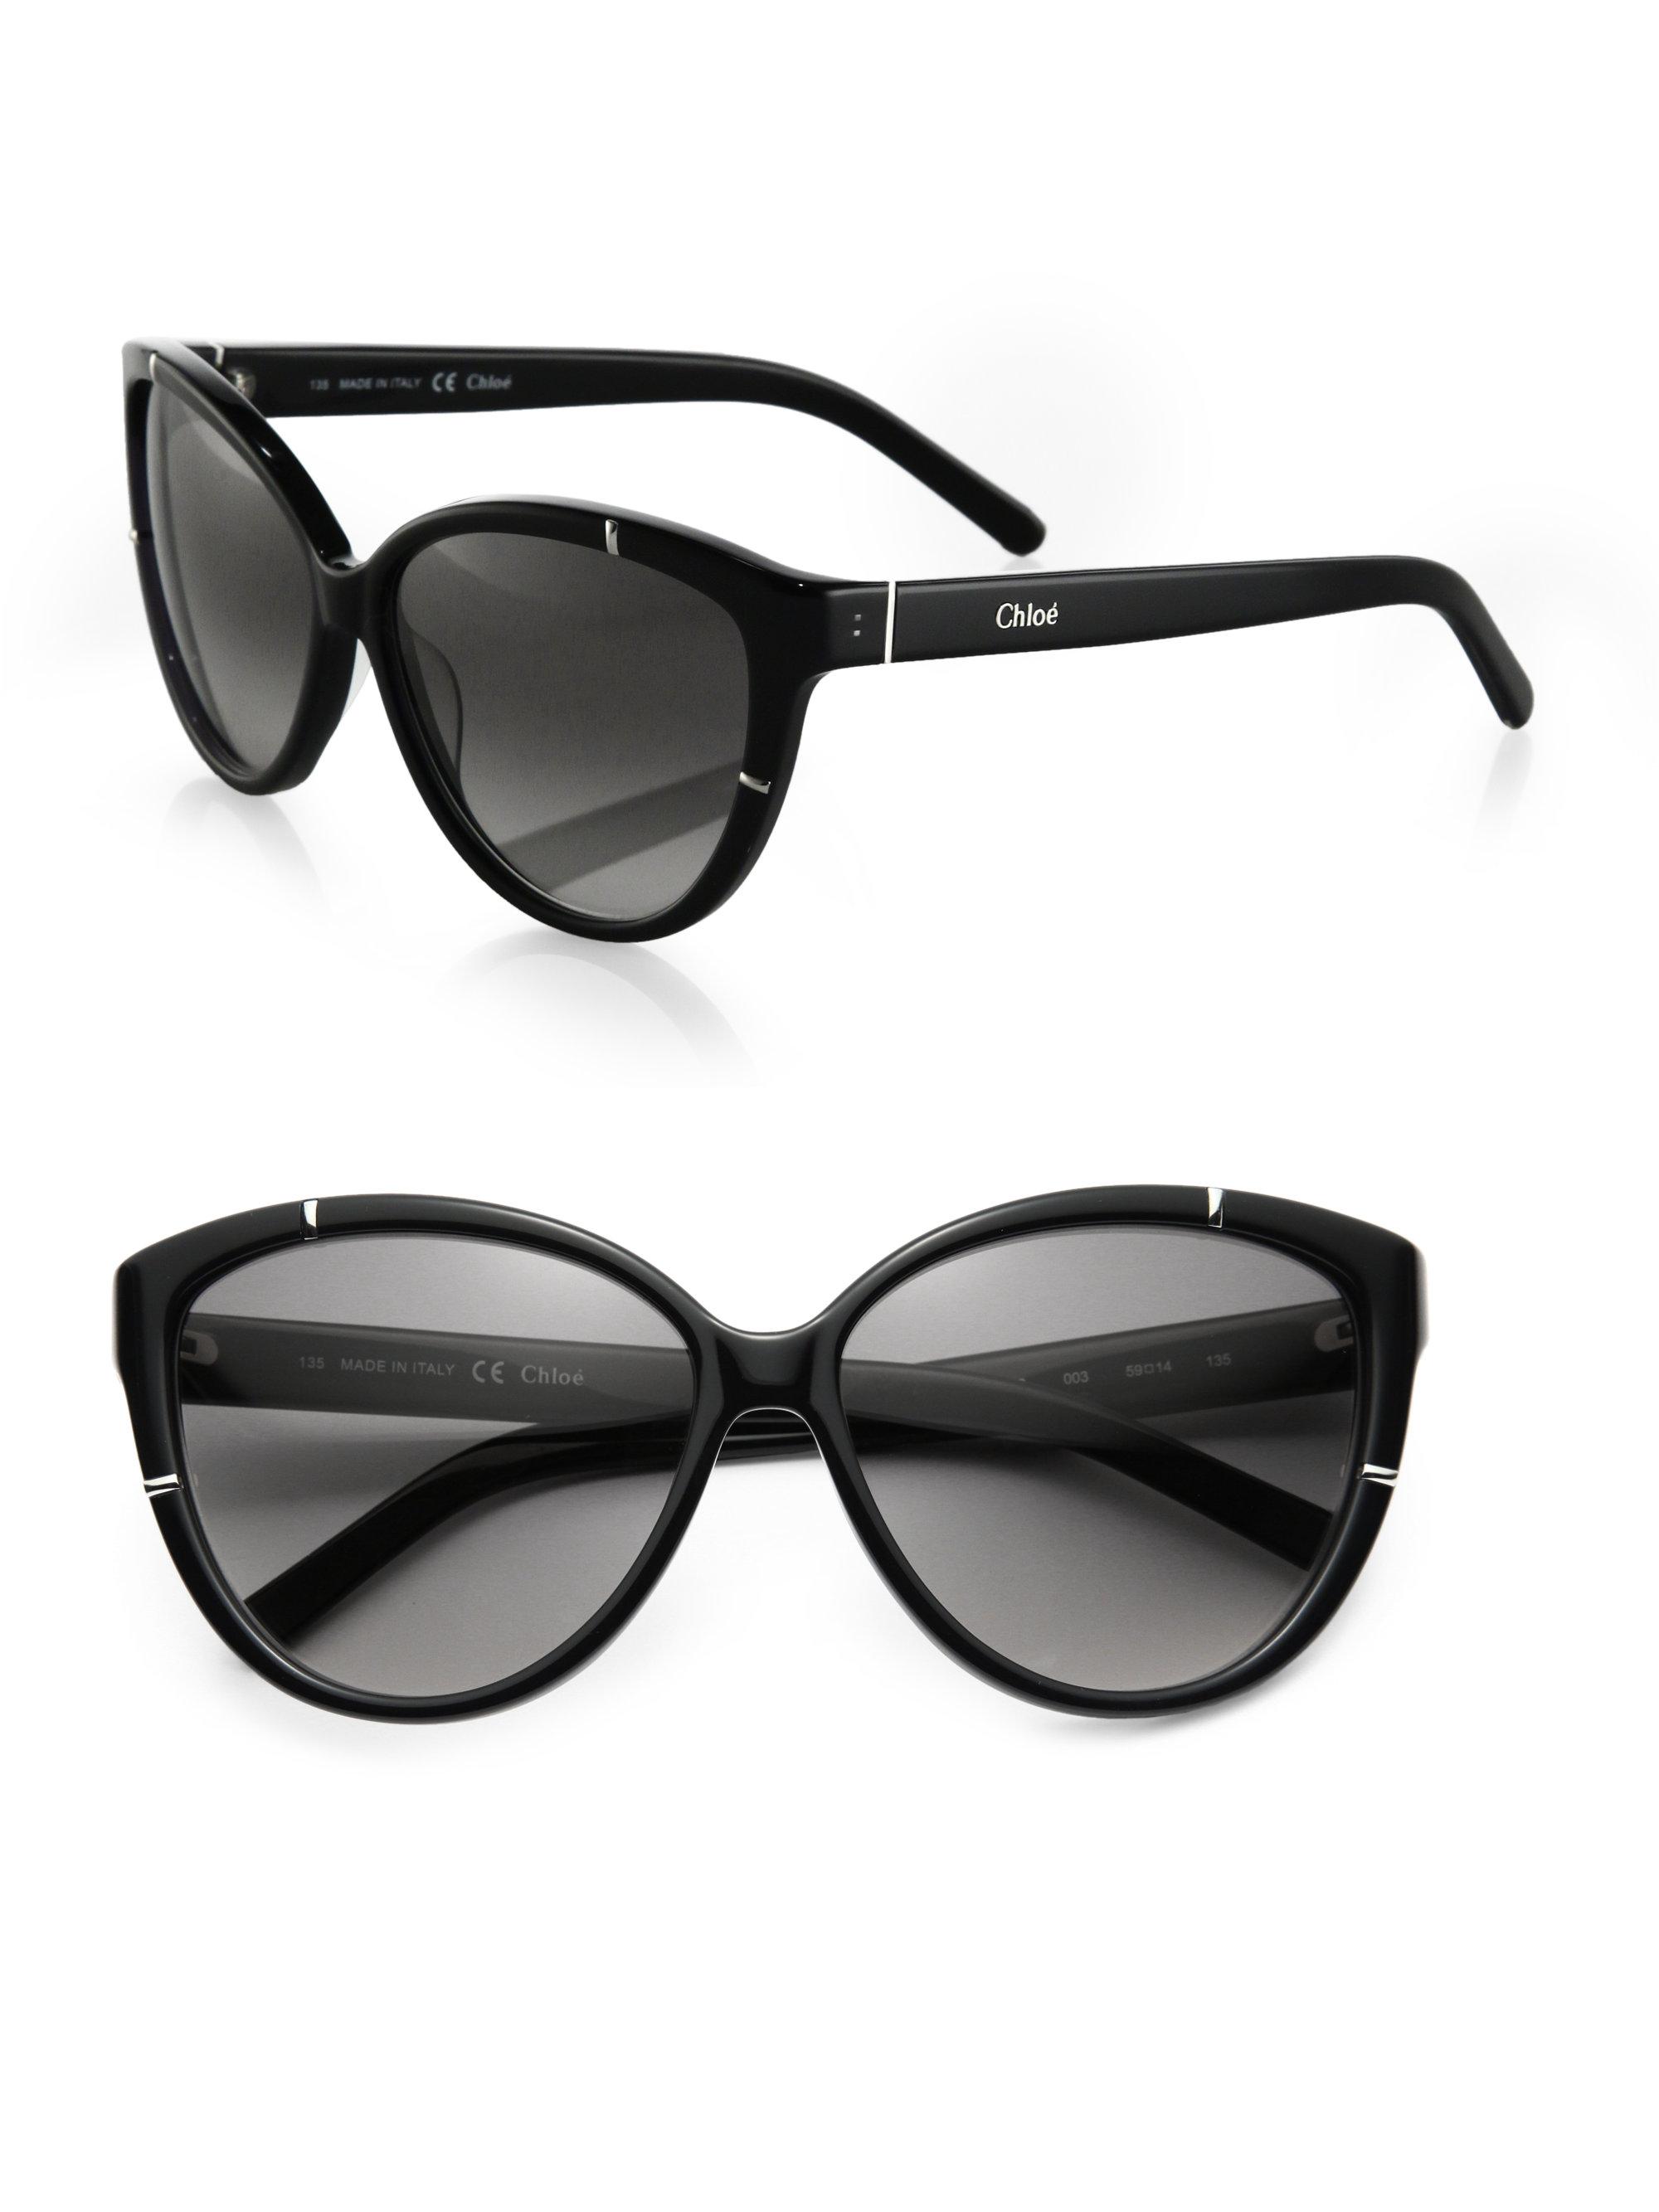 14771a9d53f Chloe Cl2233 Sunglasses Black